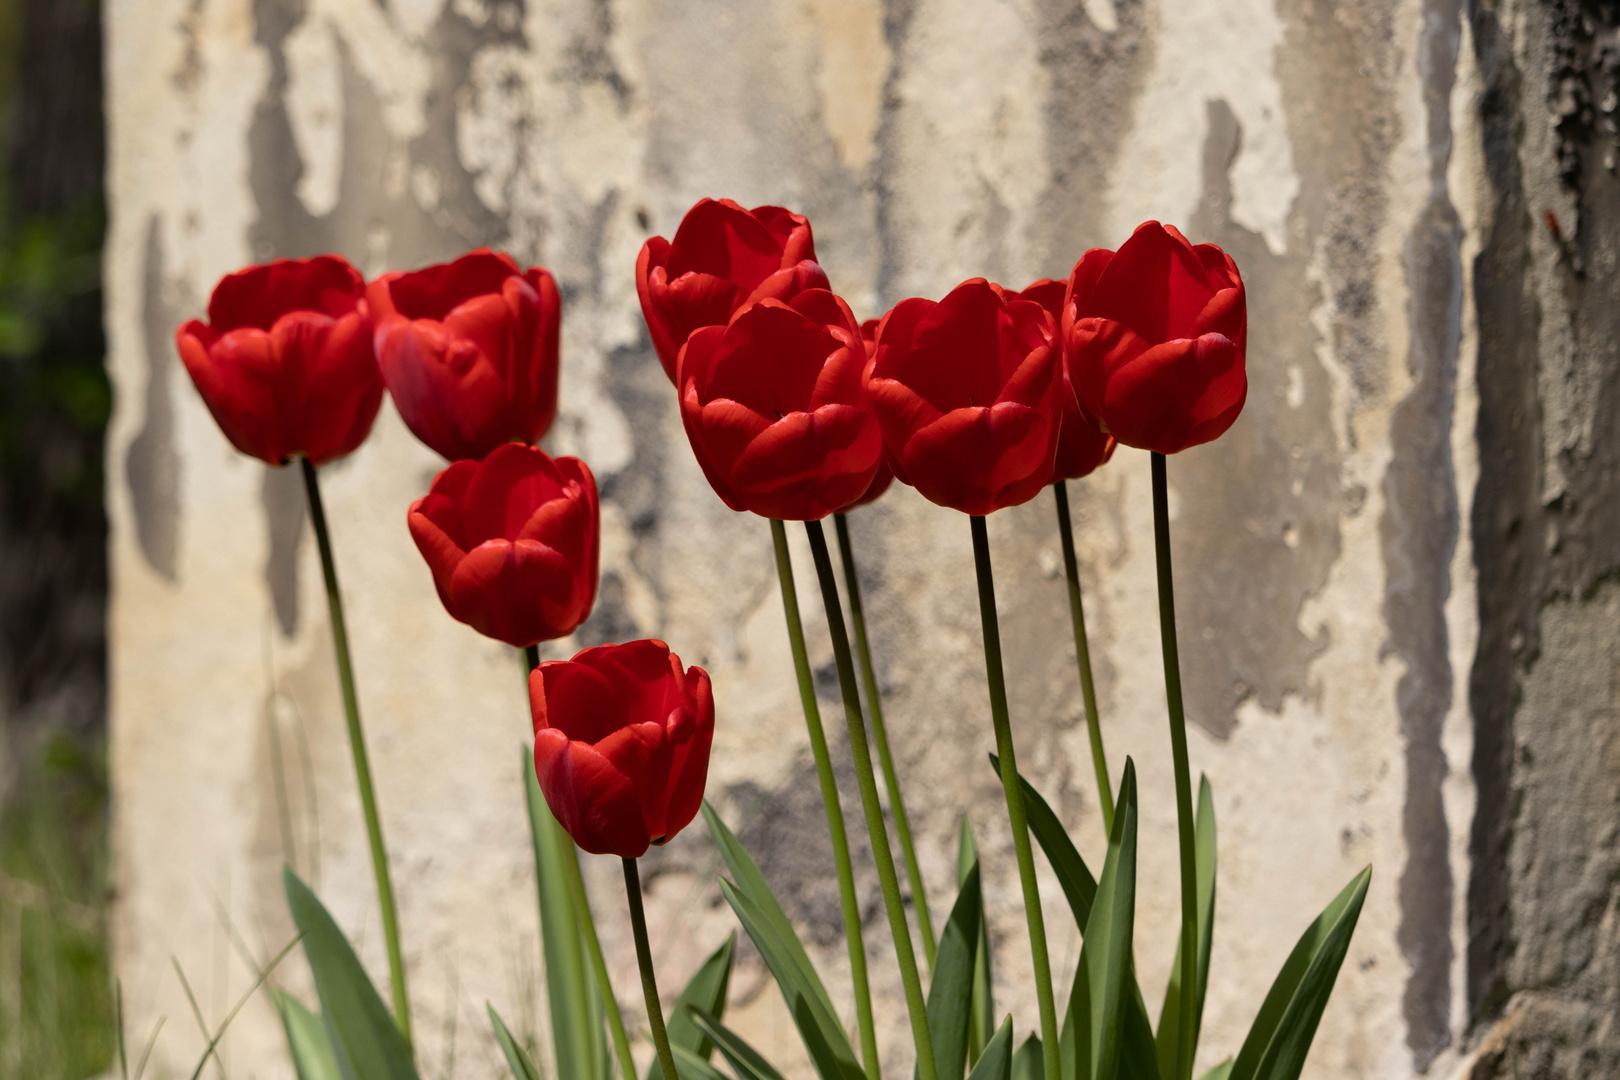 Wandteppich aus Tulpen